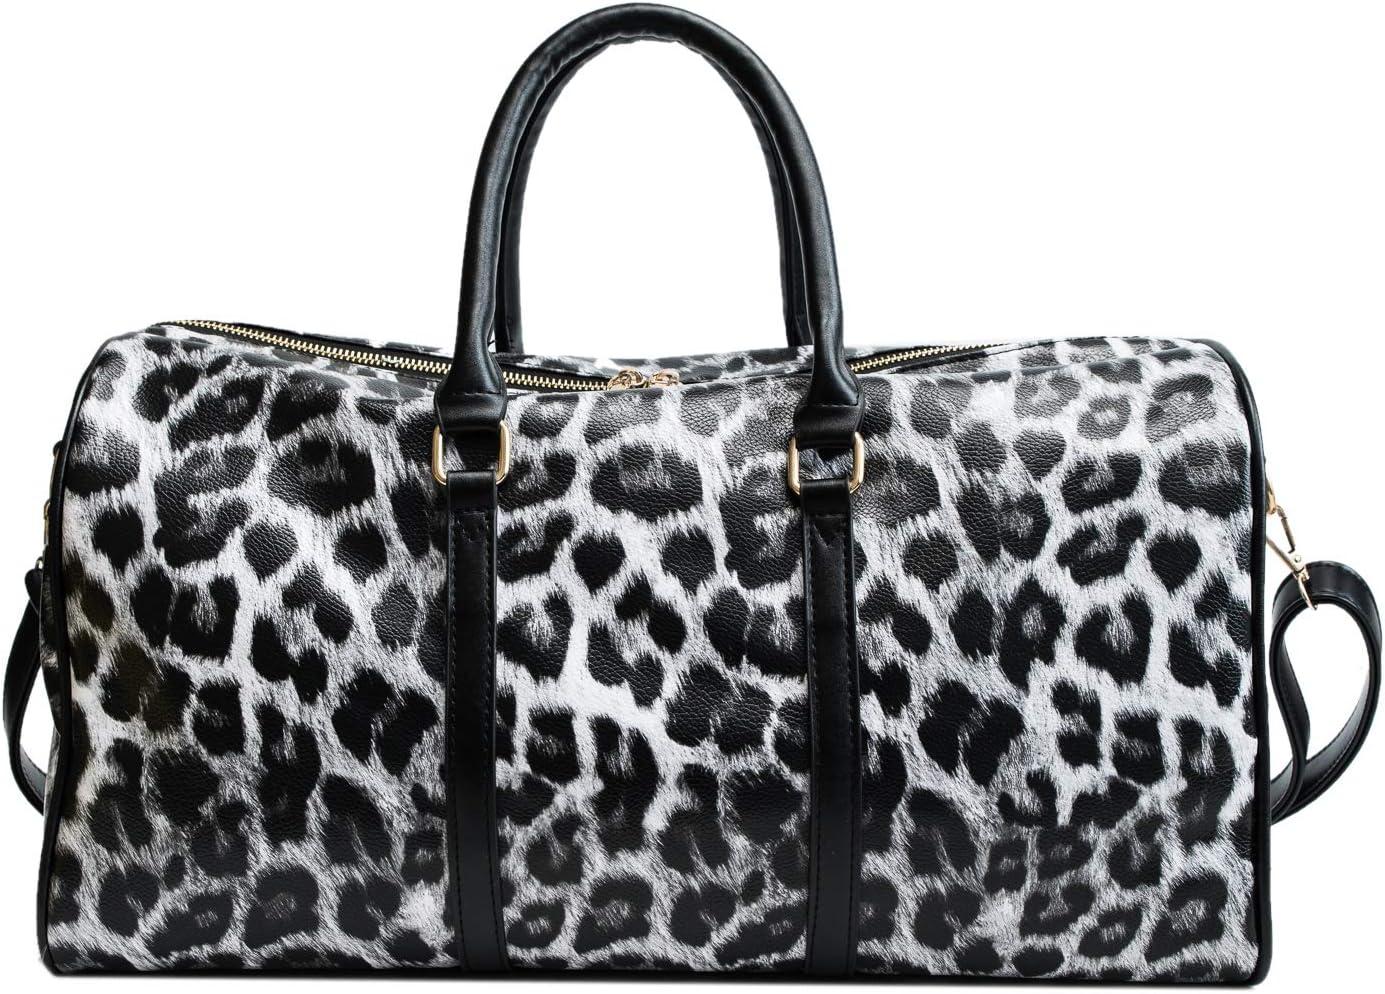 QUARKERA Leopard Leather Weekender Travel Bag for Women Girls Cheetah Animal Print Duffle Overnight Tote Shoulder Bags Large